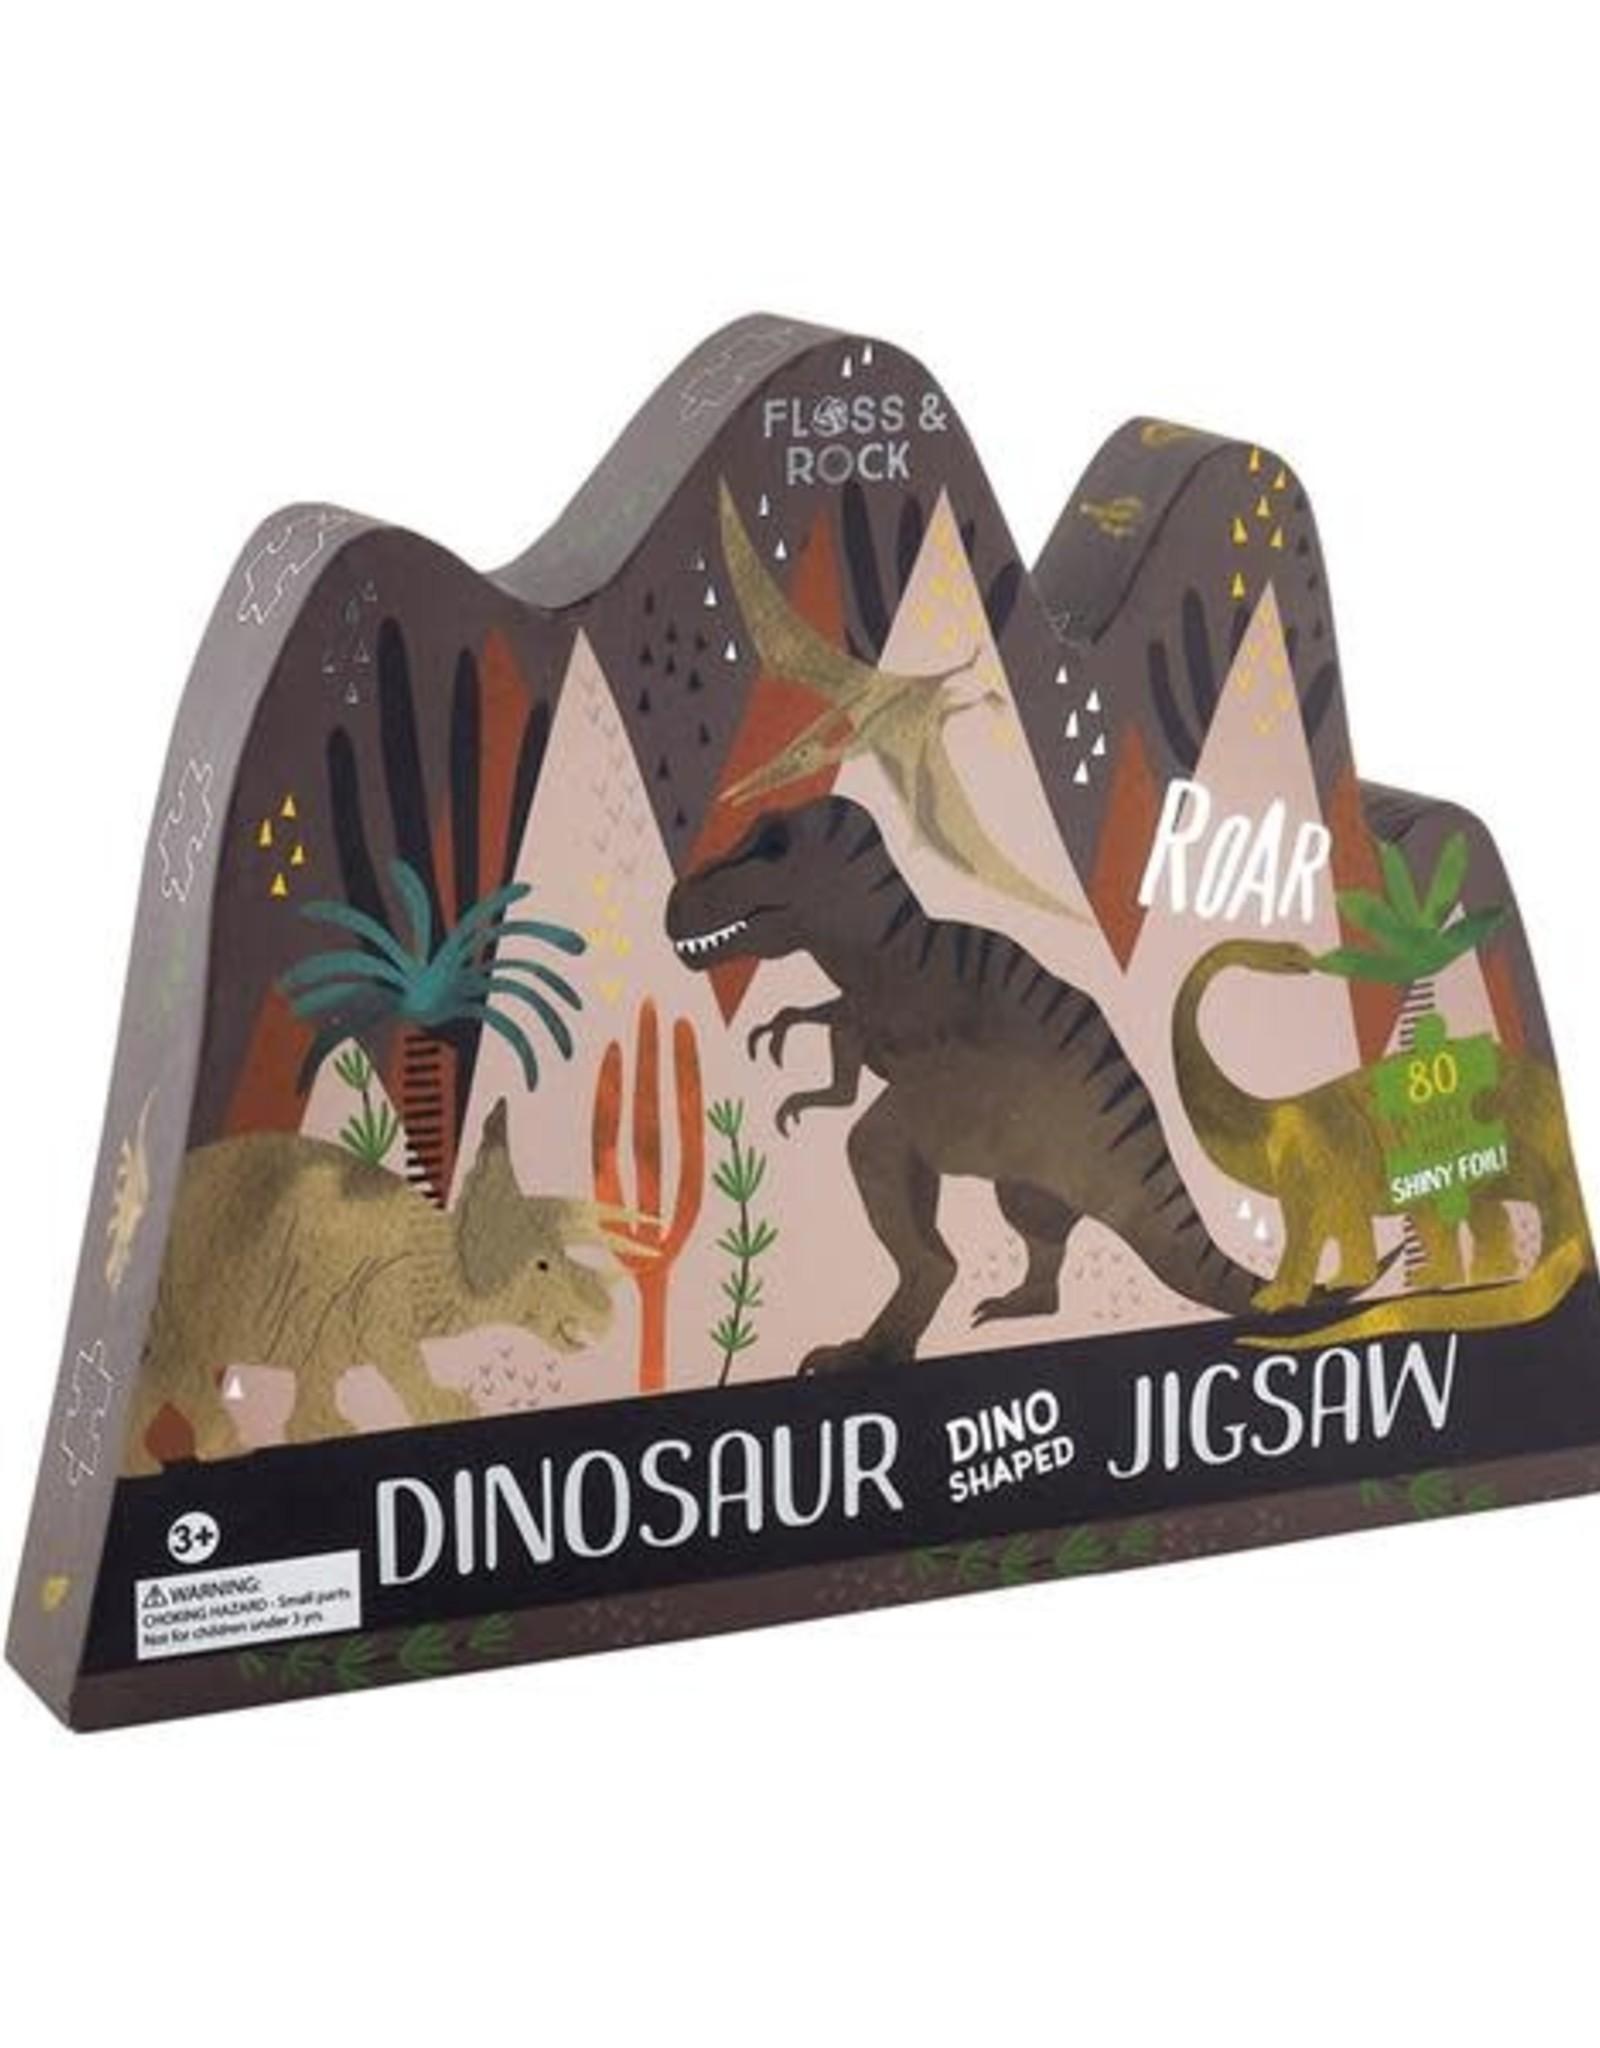 Floss & Rock 80pc Dinosaur Jigsaw Shaped